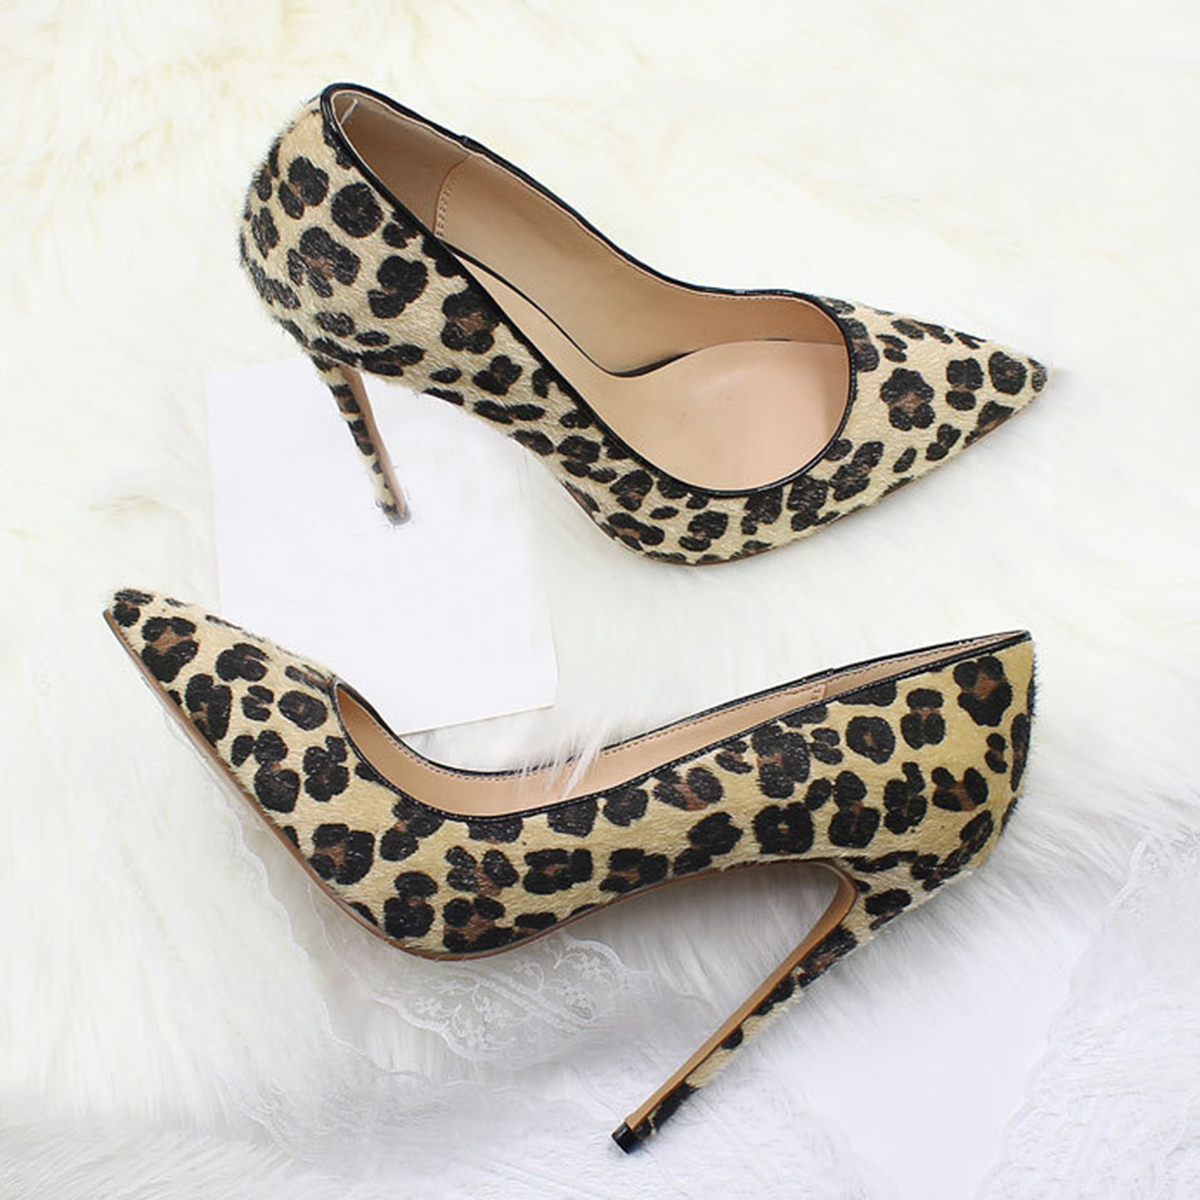 Dünne Sexy Schuhe Spitz A Slip Stilettos b f d High Pumpen Frühling Sommer Party Heels Auf Fersen c Clubwear e Muster Leopard Frauen O75wdq7